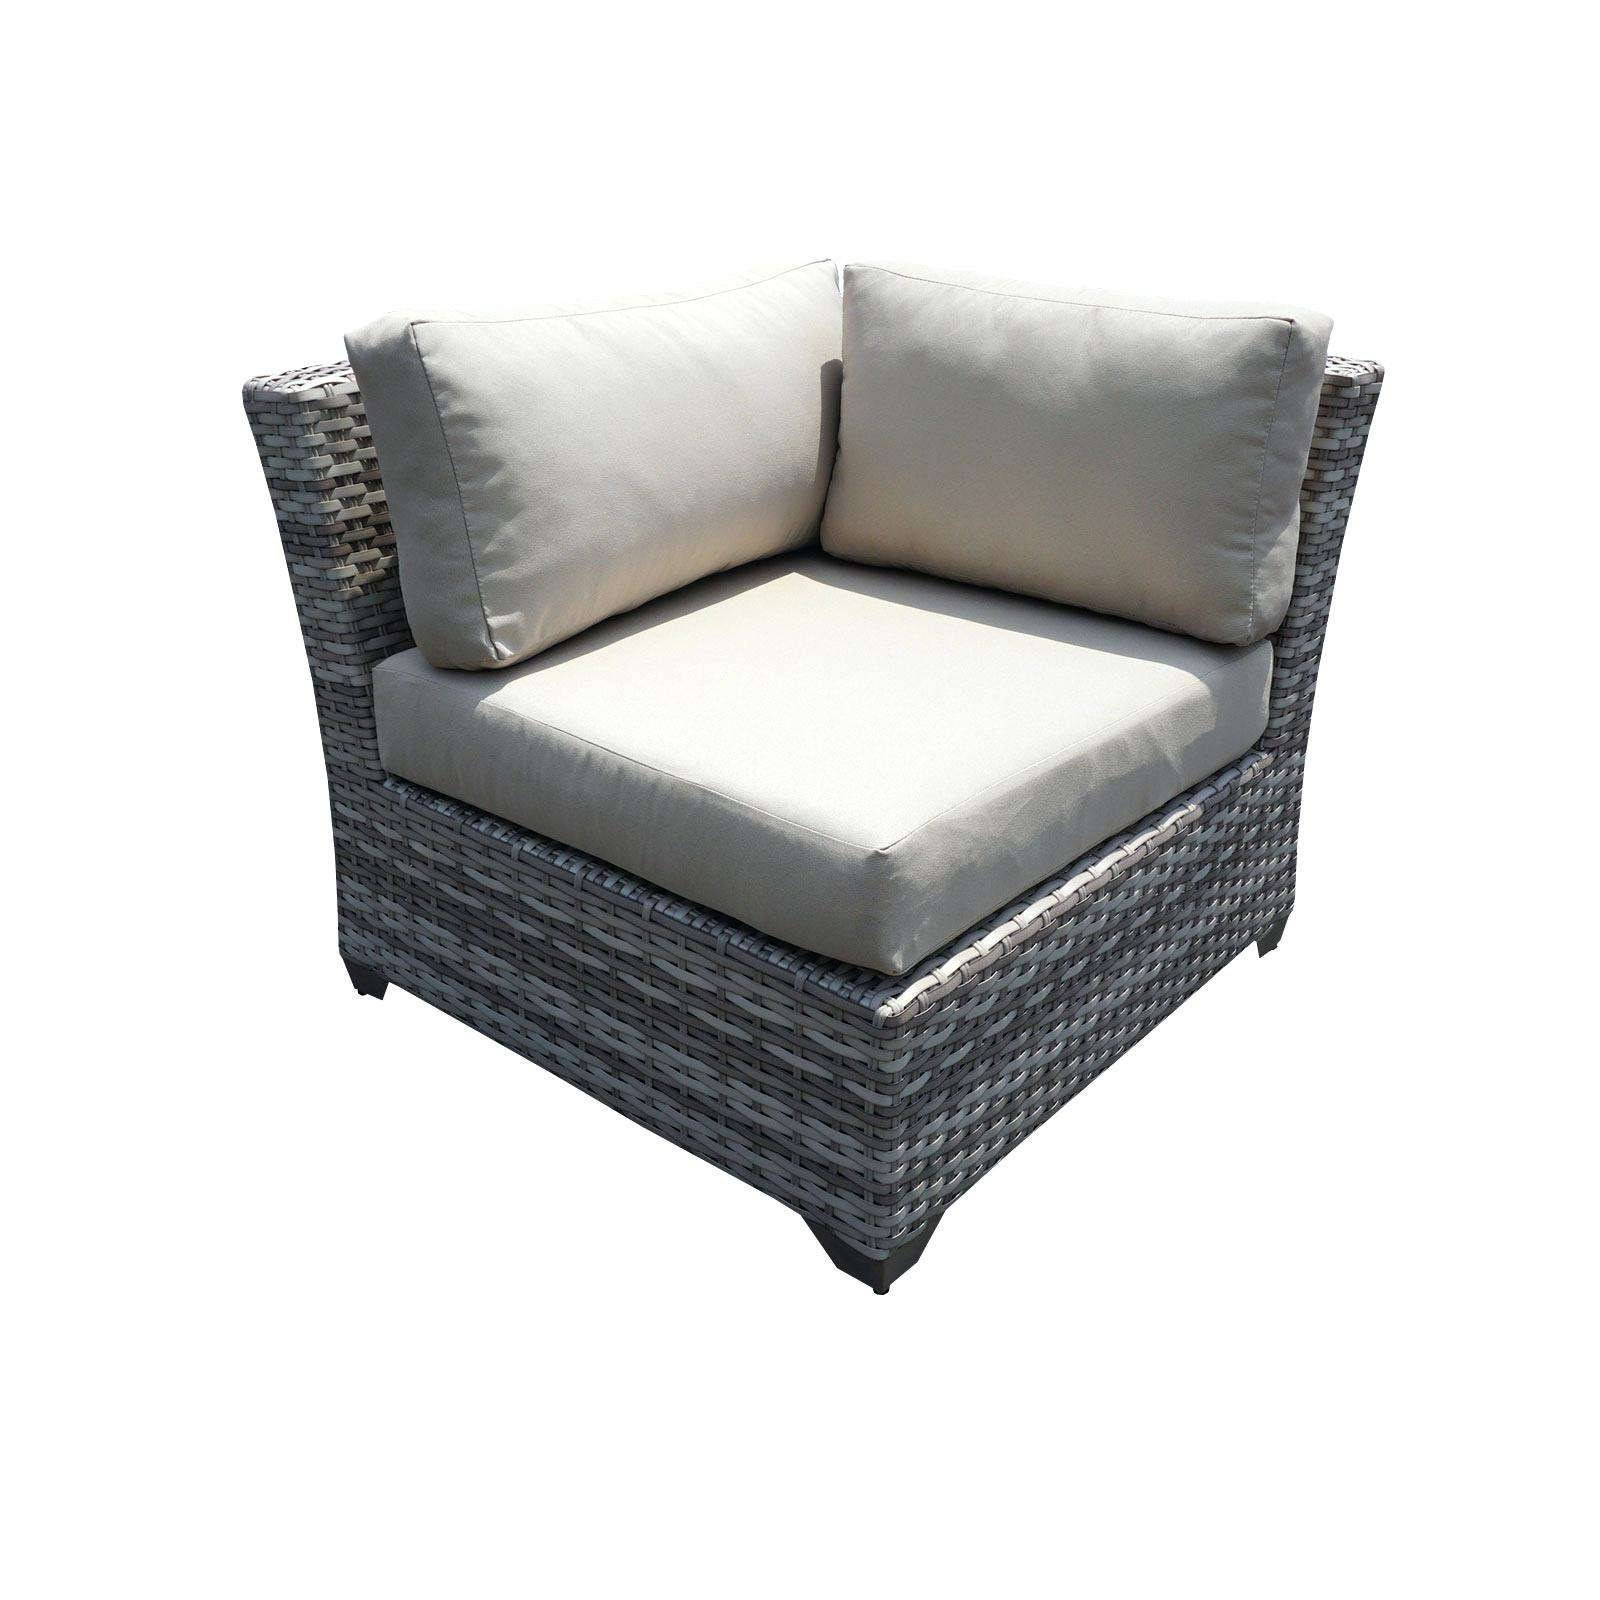 diy pallet decking elegant fresh pallet outdoor furniture wicker outdoor sofa 0d patio chairs of diy pallet decking